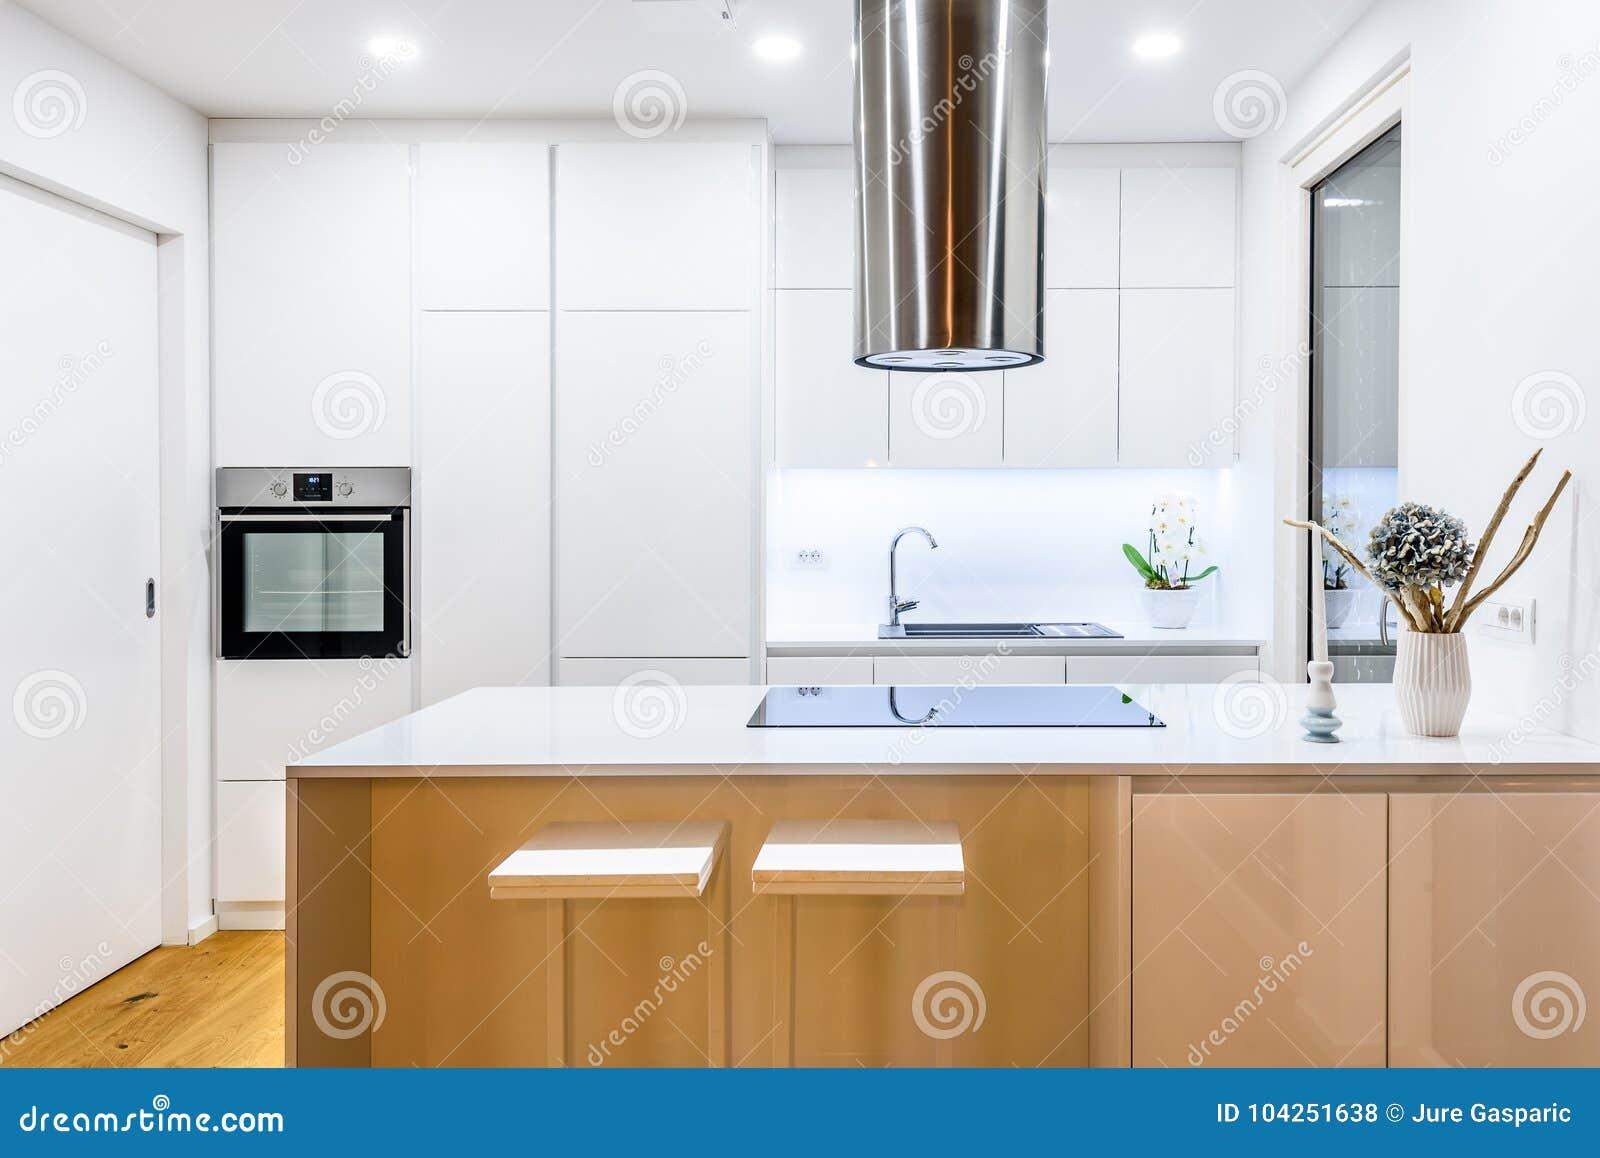 Interior Design New Modern White Kitchen With Kitchen Appliances Stock Photo Image Of Modern Mansion 104251638